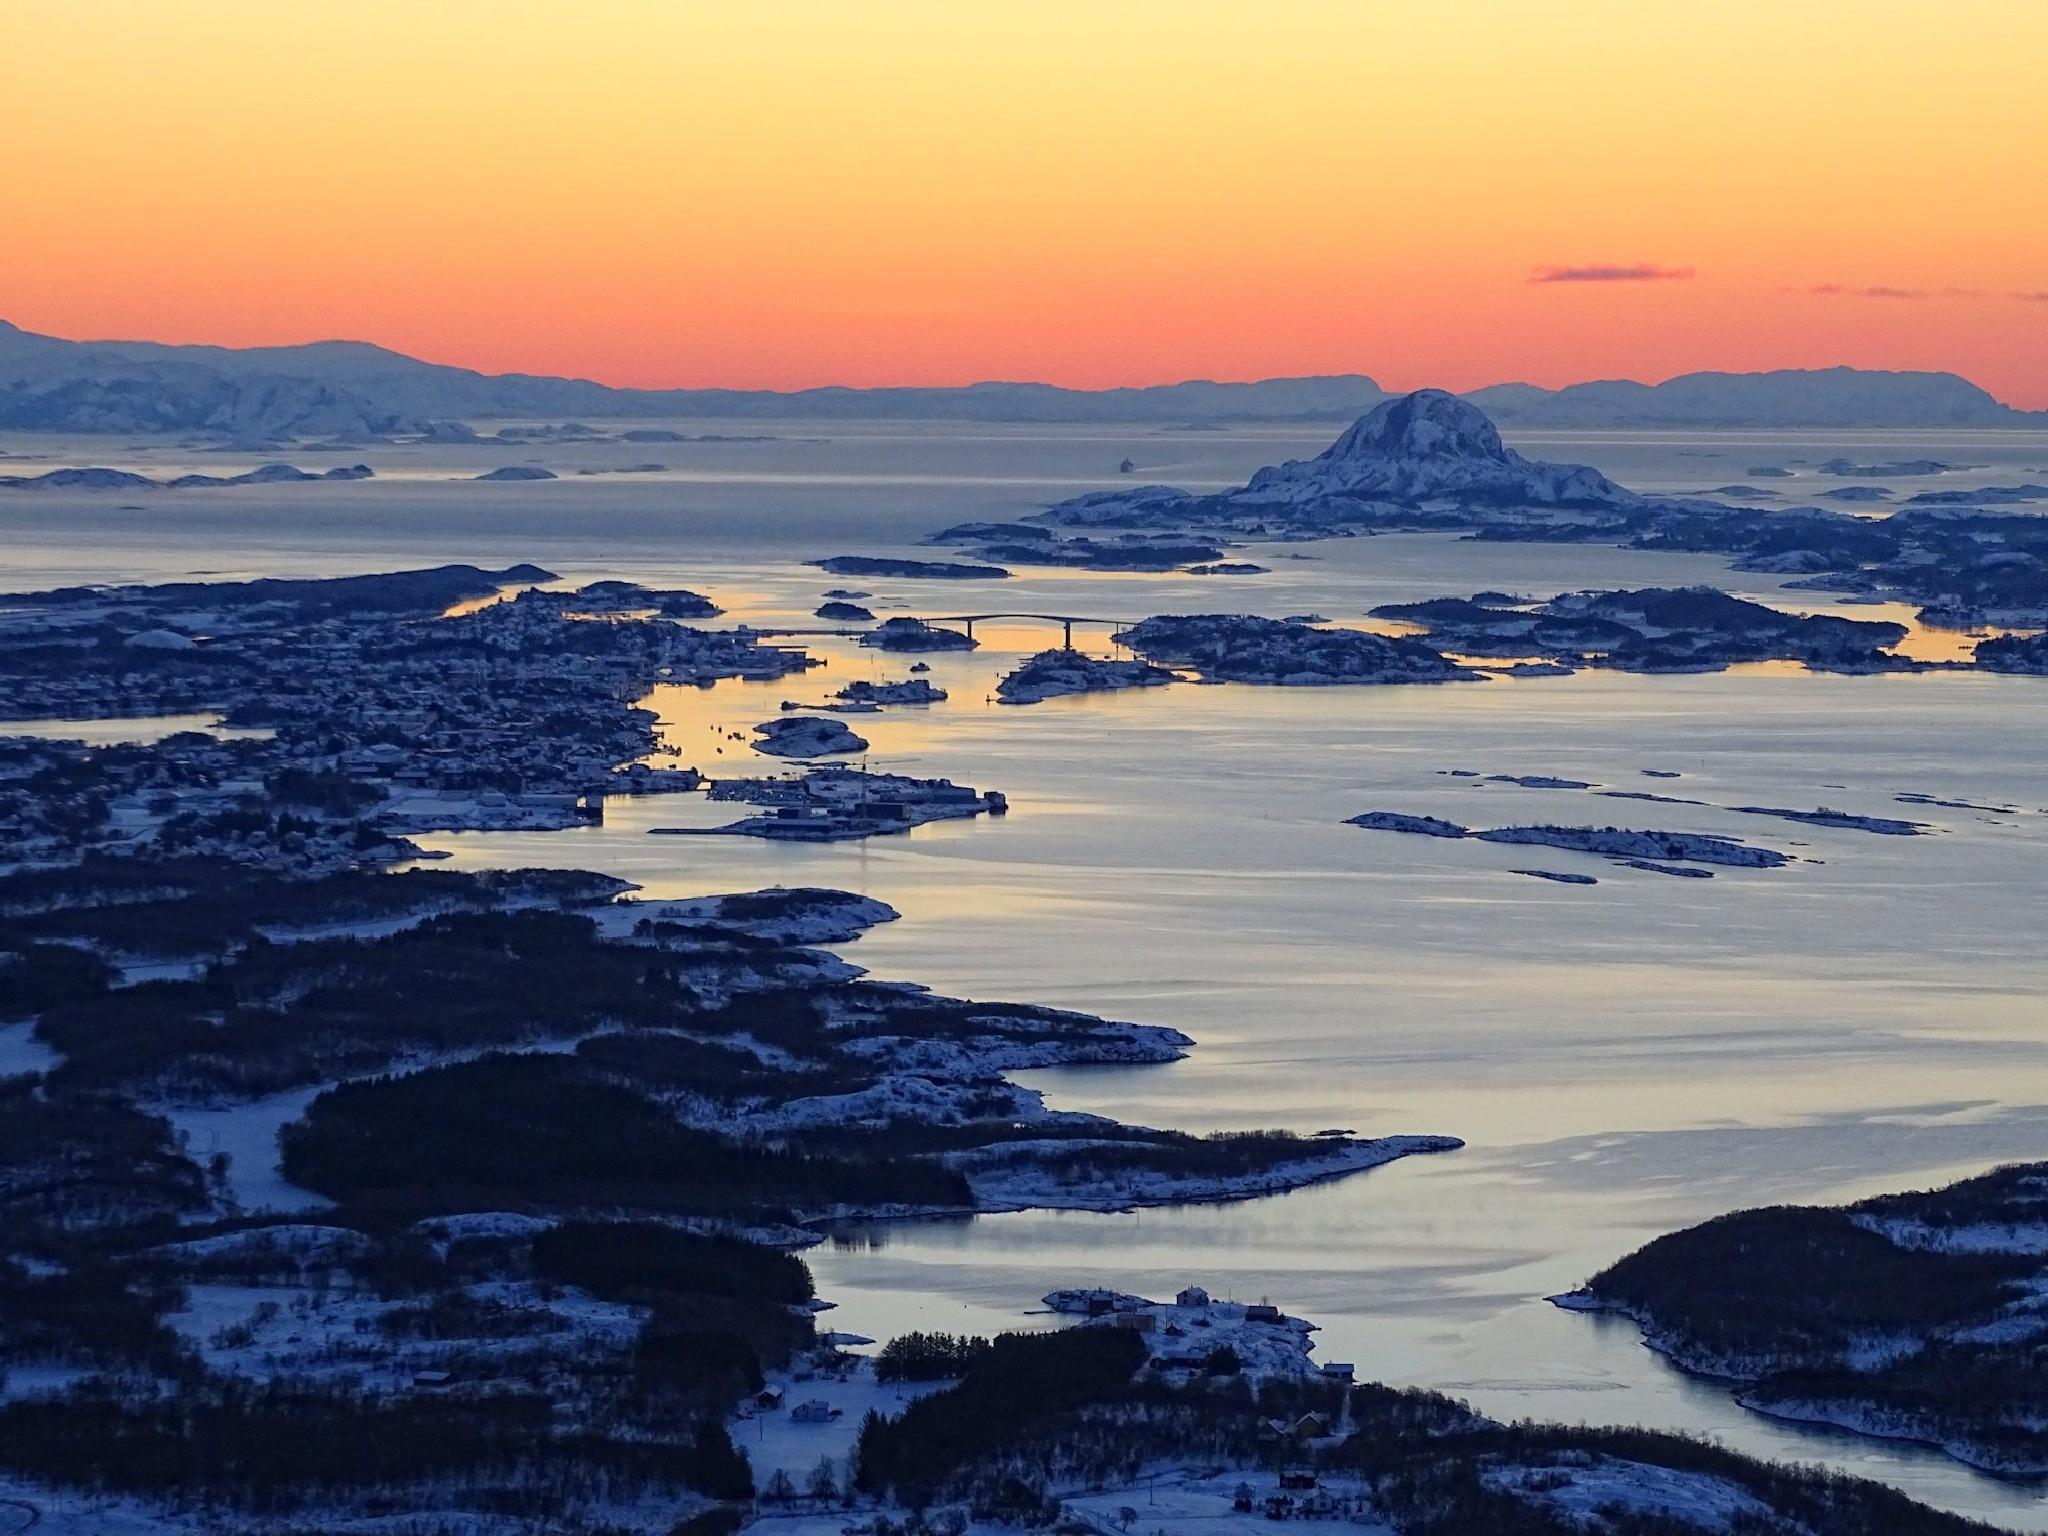 Noon in Northern Norway by Bjørn Christian Tørrissen